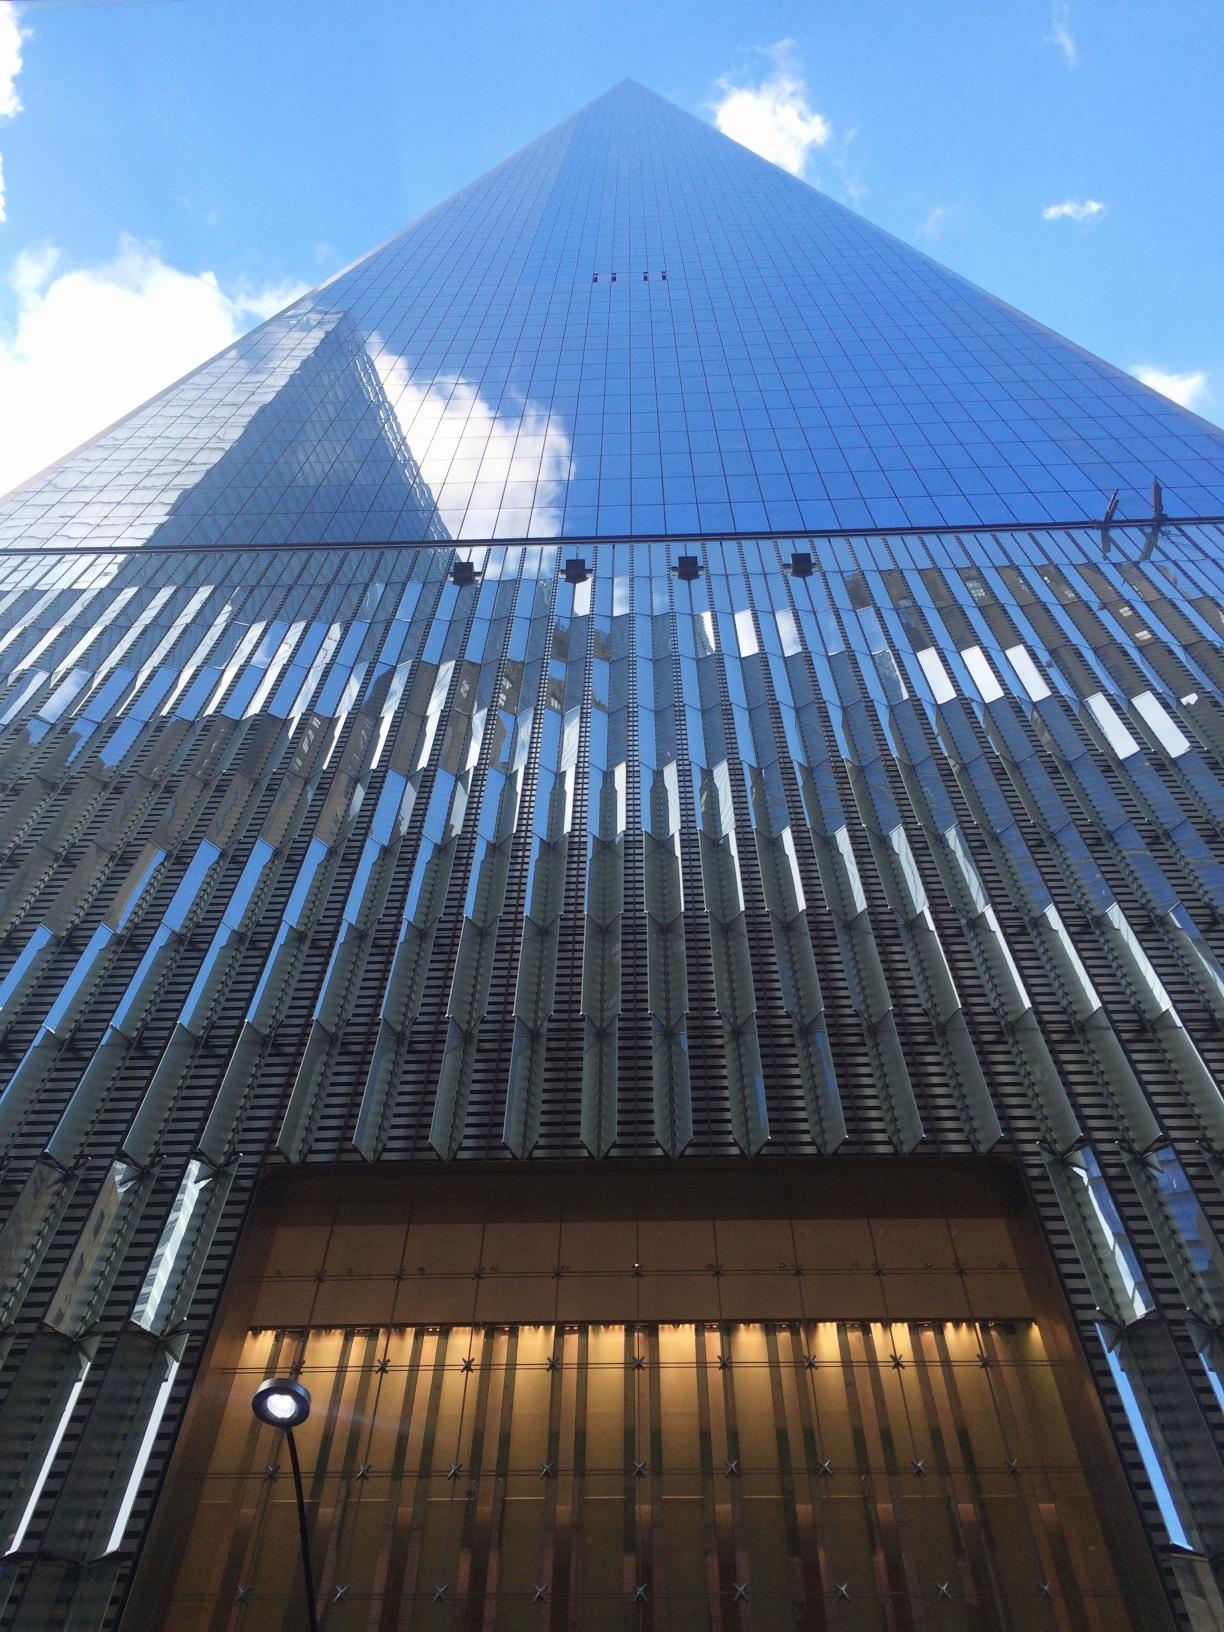 2015_10_16 national sept 11 memorial 002